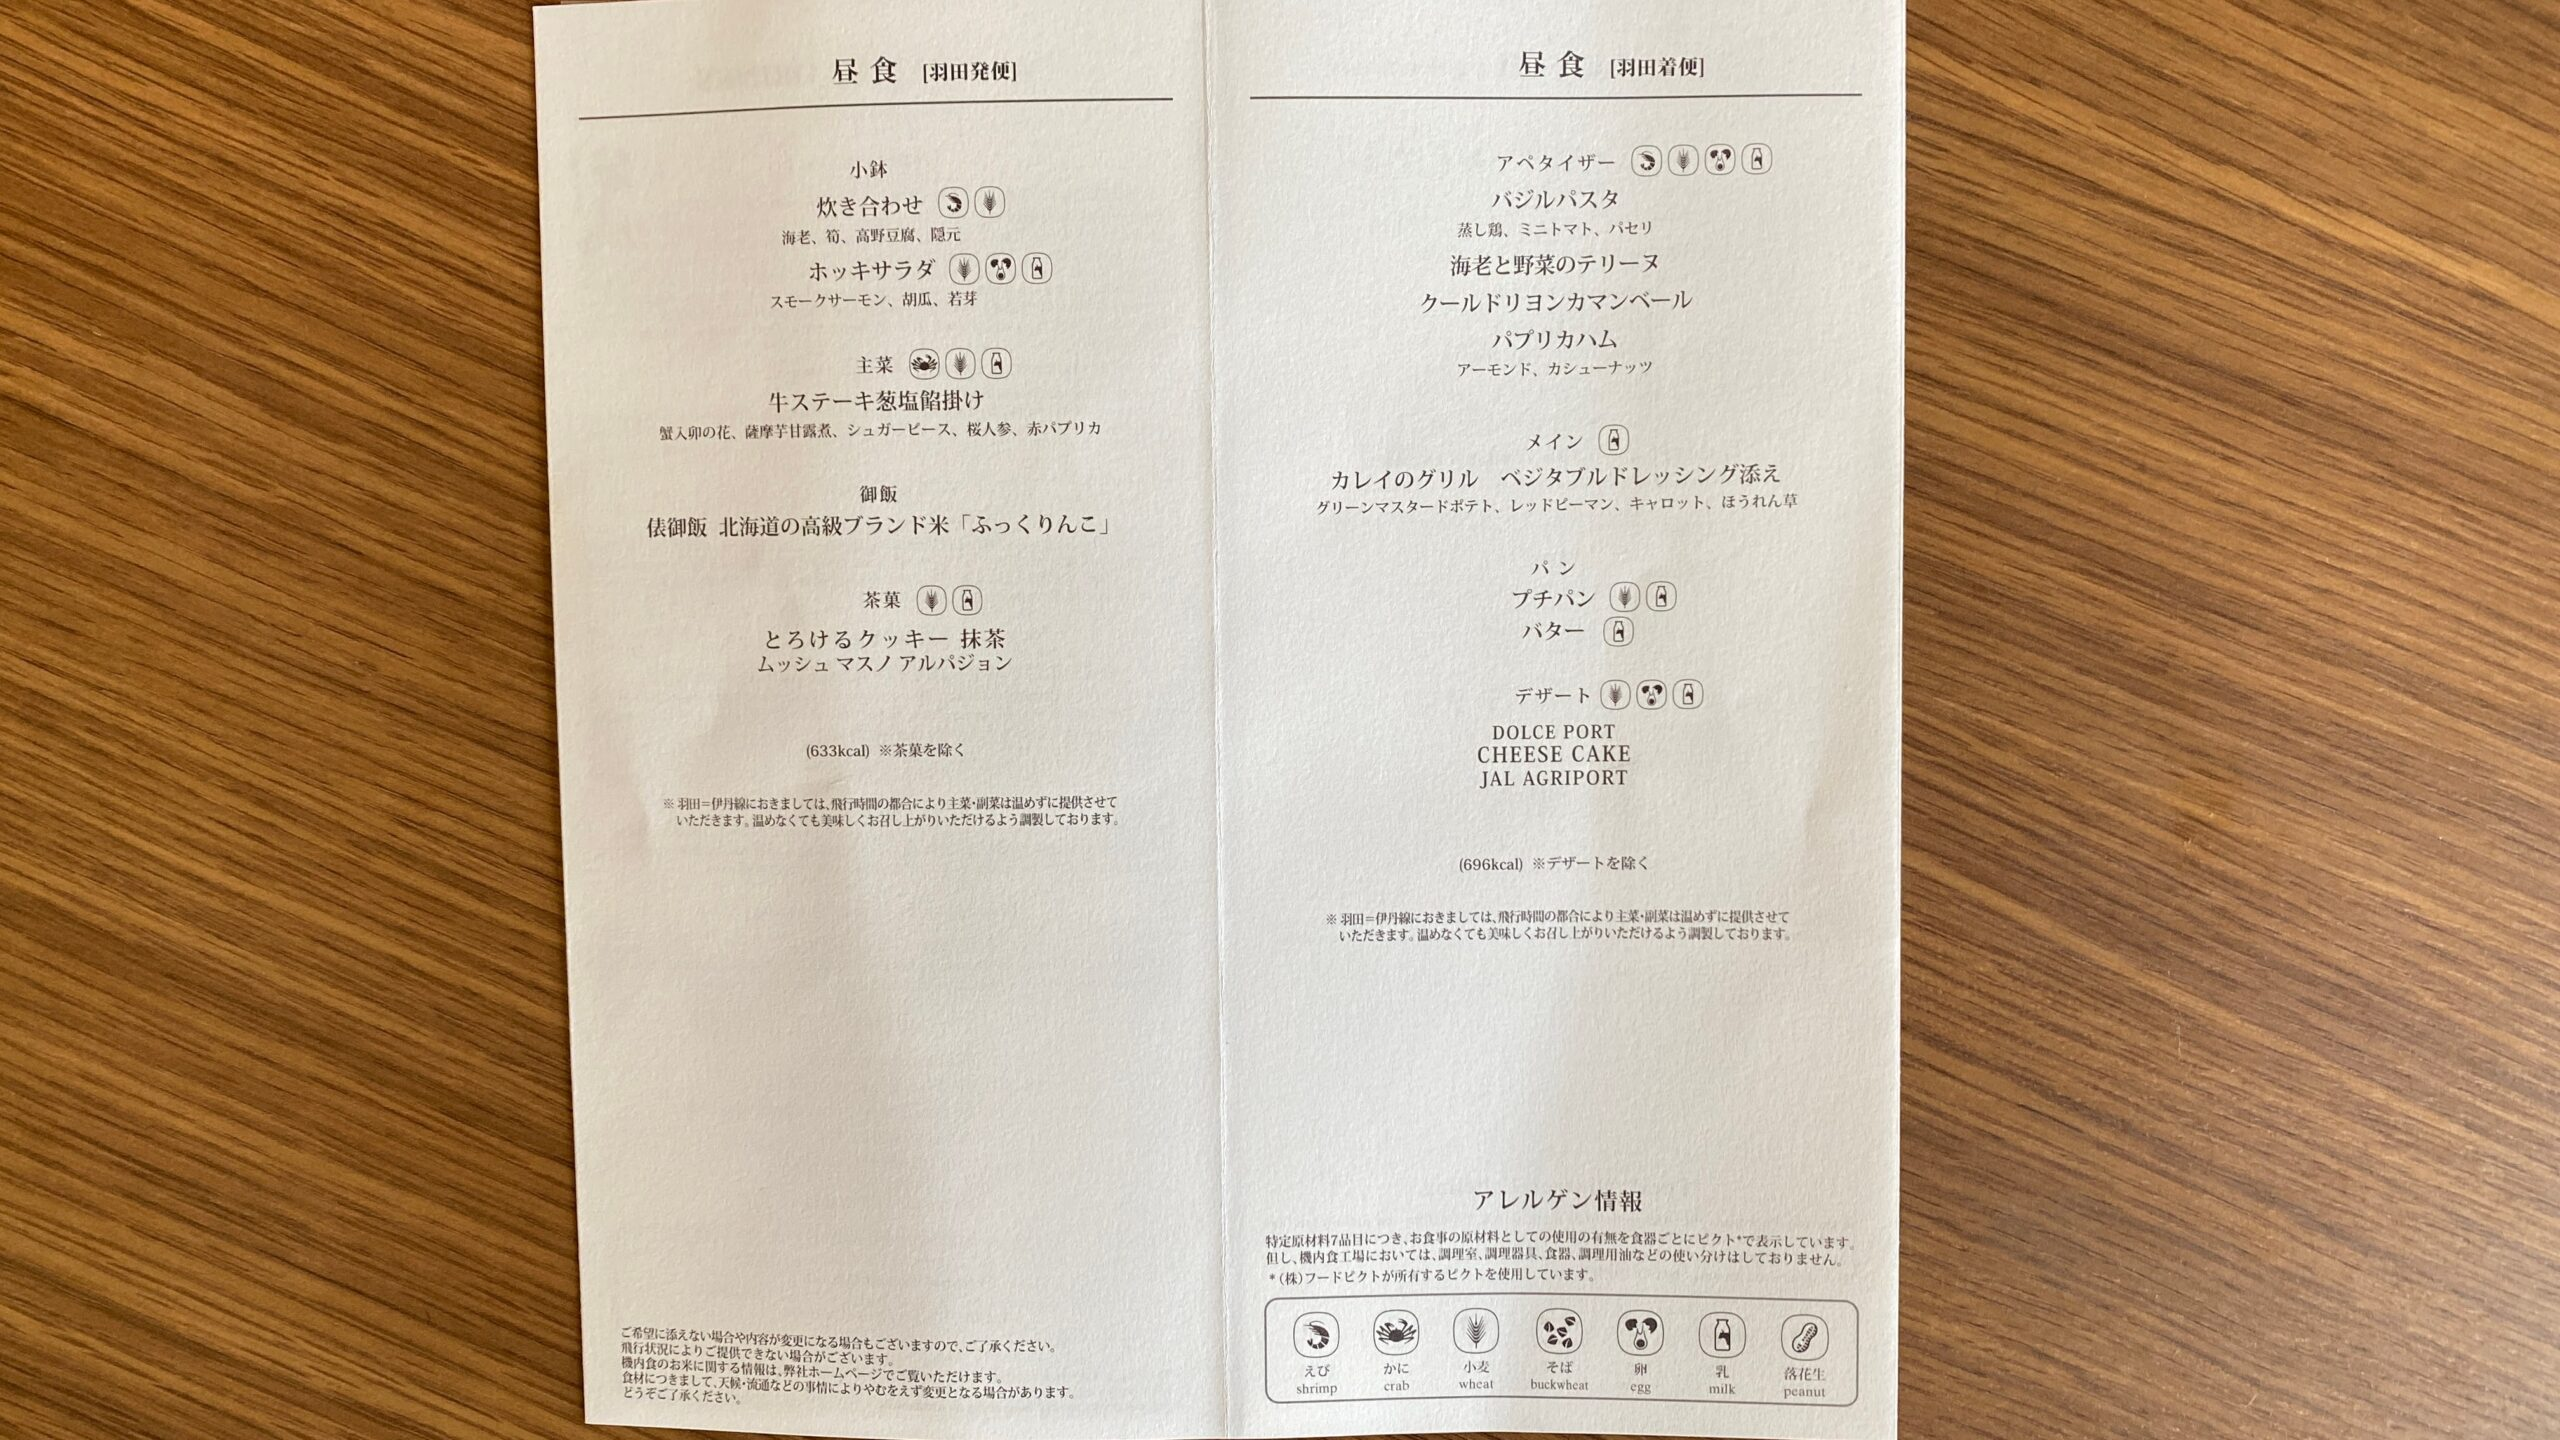 12APR21 JL127 羽田~伊丹 ファーストクラス 機内食